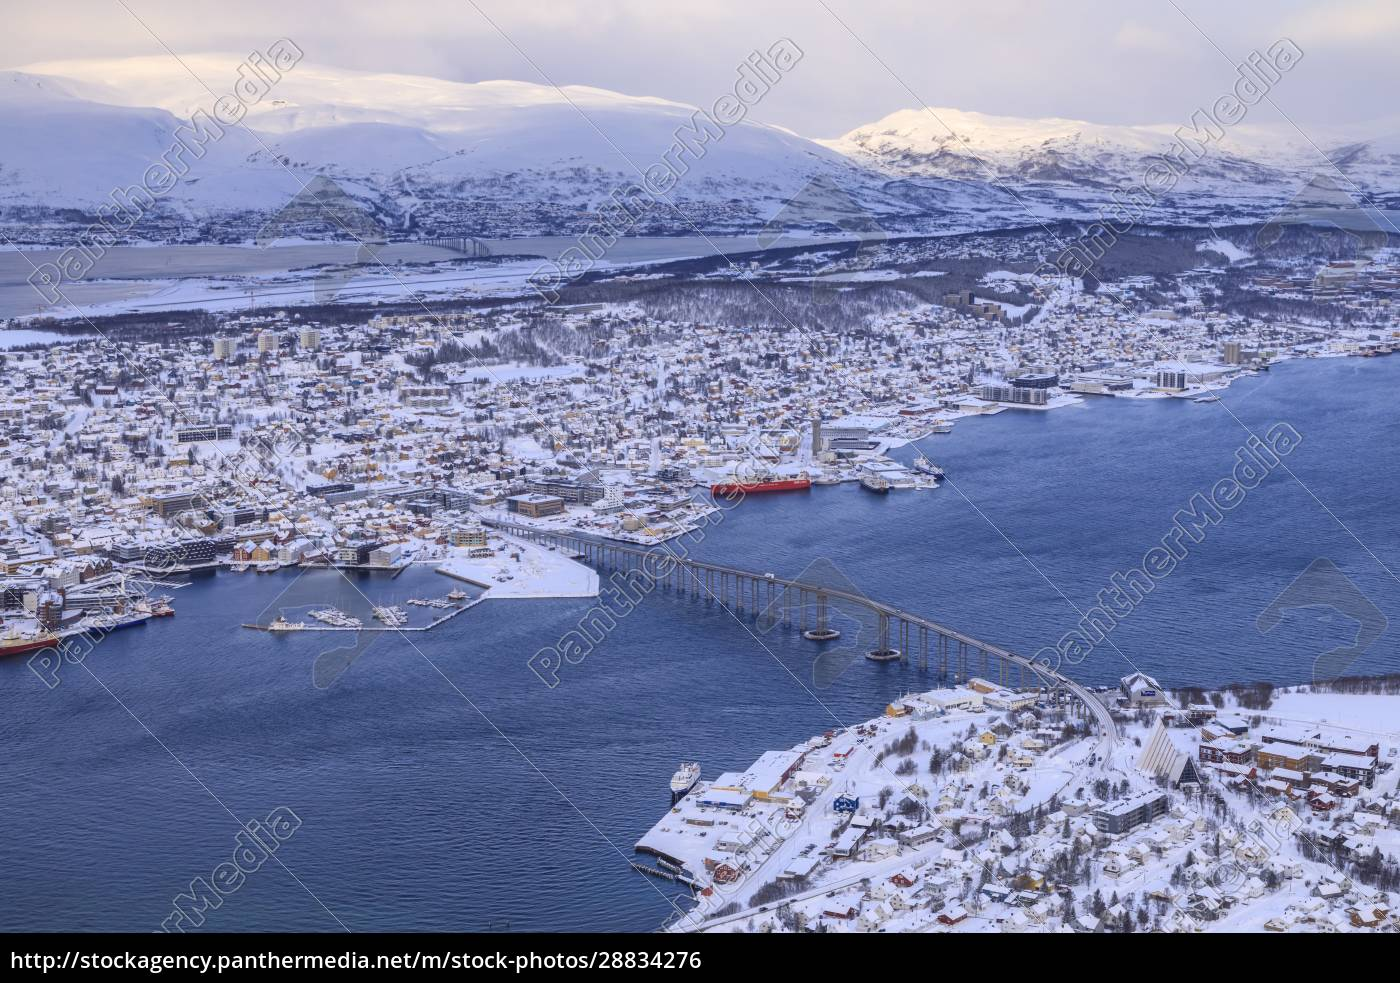 tromso, tromsoya, und, fjord, nach, starkem, schneefall, erhöhter, blick - 28834276